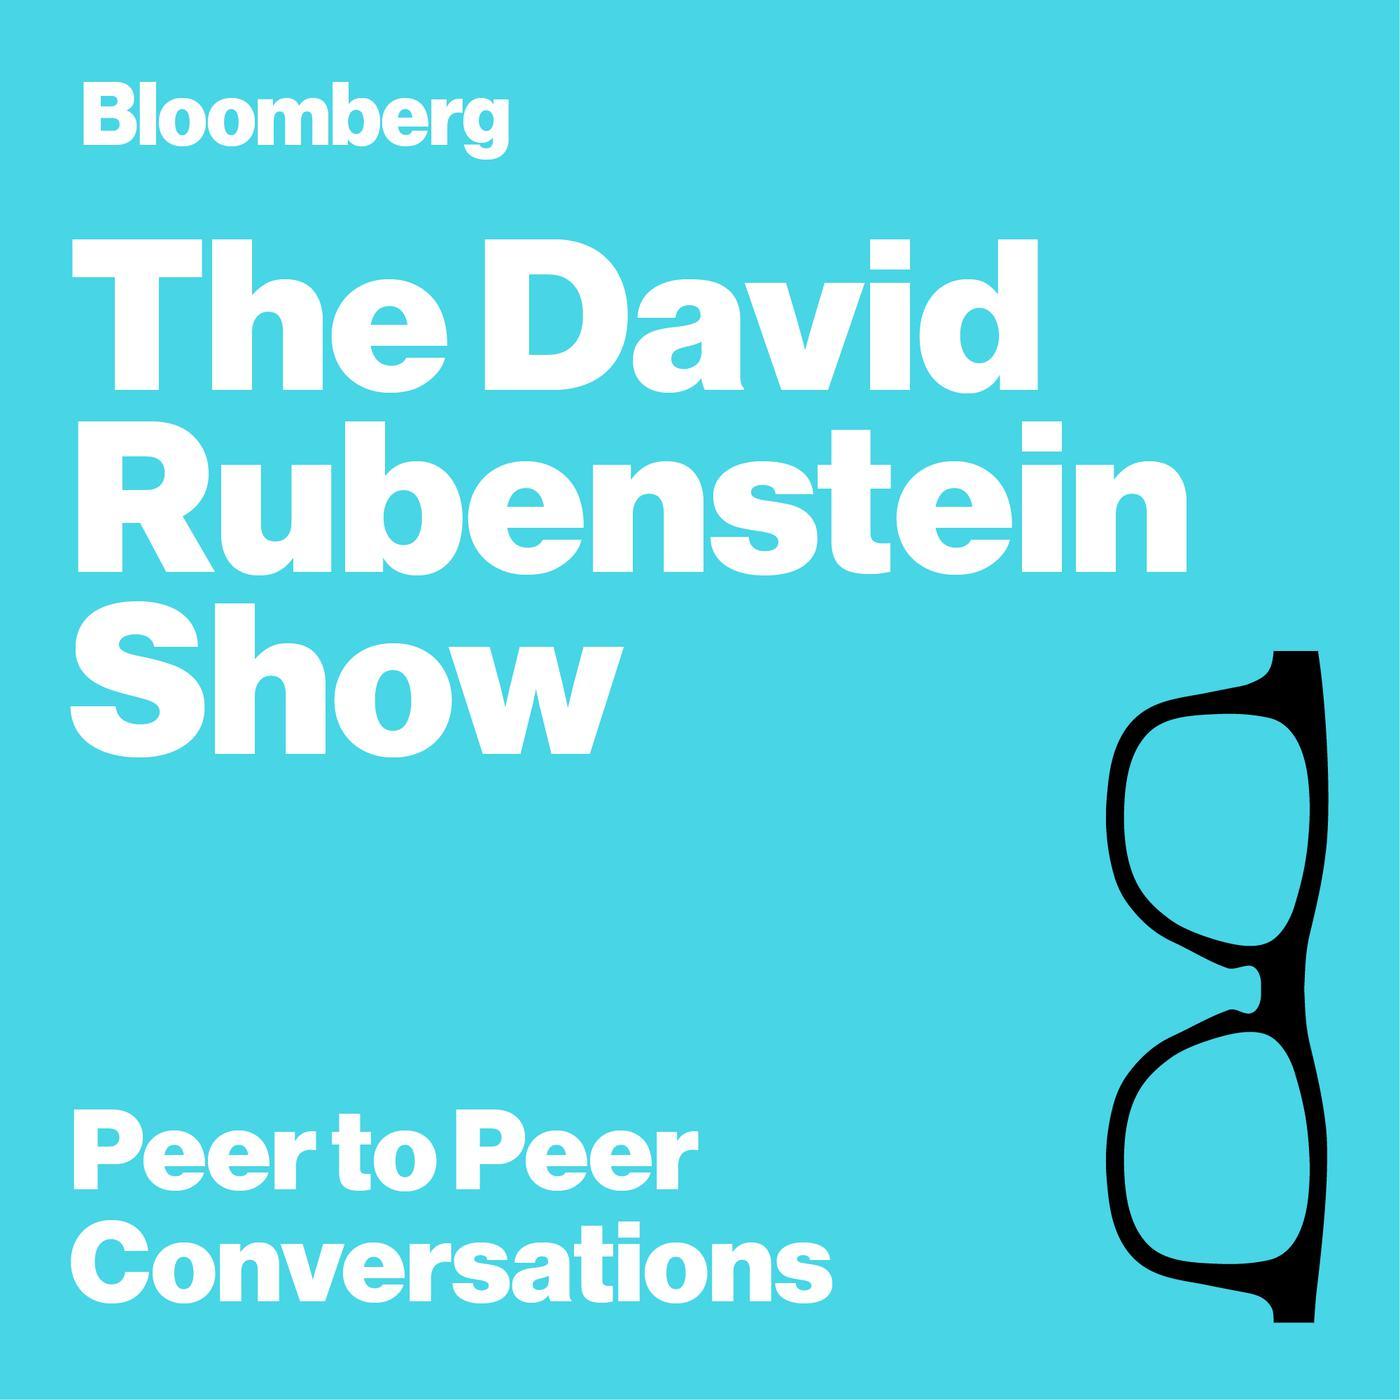 The David Rubenstein Show (podcast) - Bloomberg TV   Listen